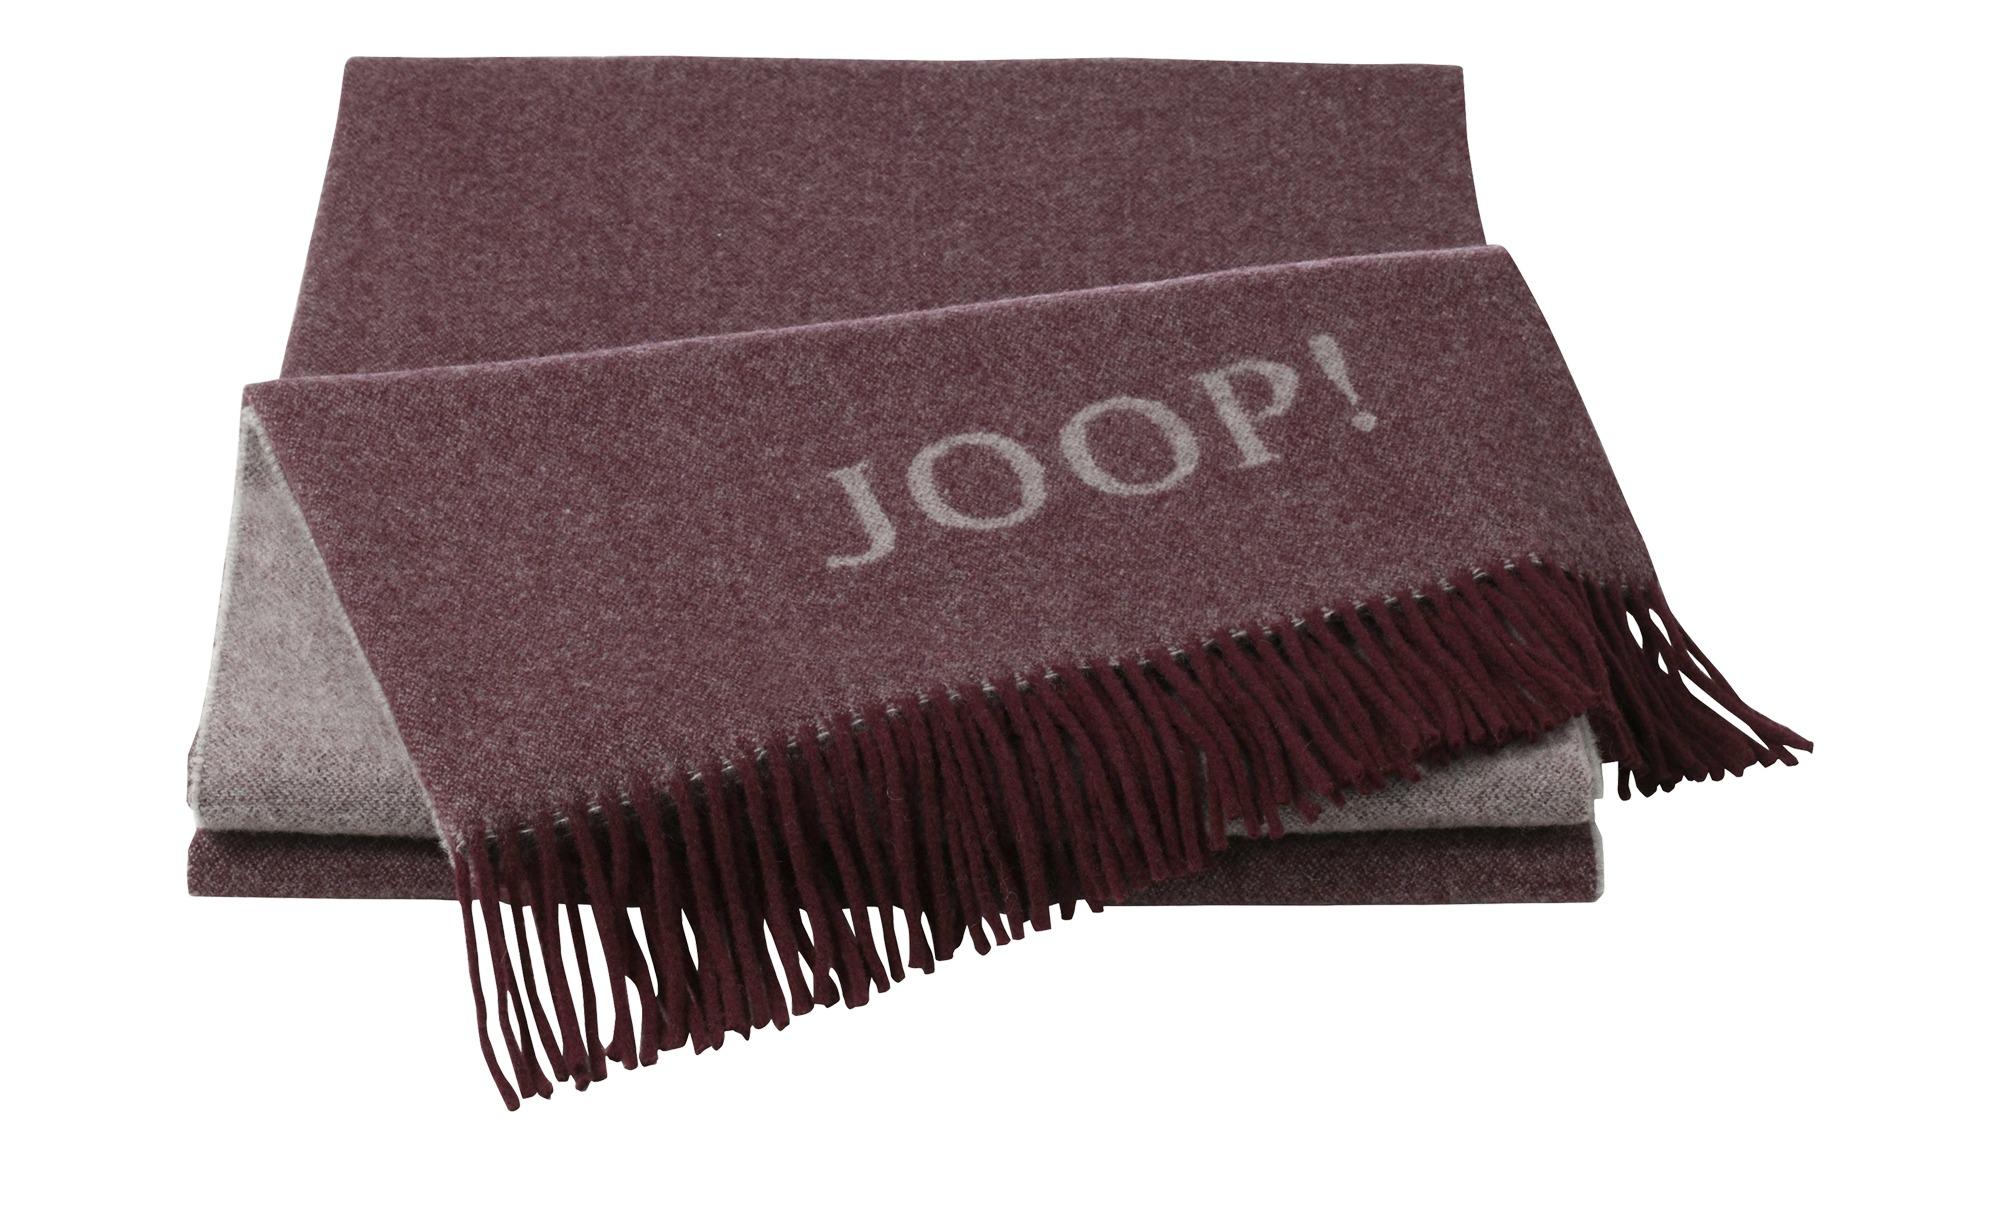 JOOP! Wohndecke  JOOP! Fine Doubleface ¦ rot ¦ 80% Wolle, 20% Kashmir ¦ Maße (cm): B: 130 Heimtextilien > Kuscheldecken - Höffner